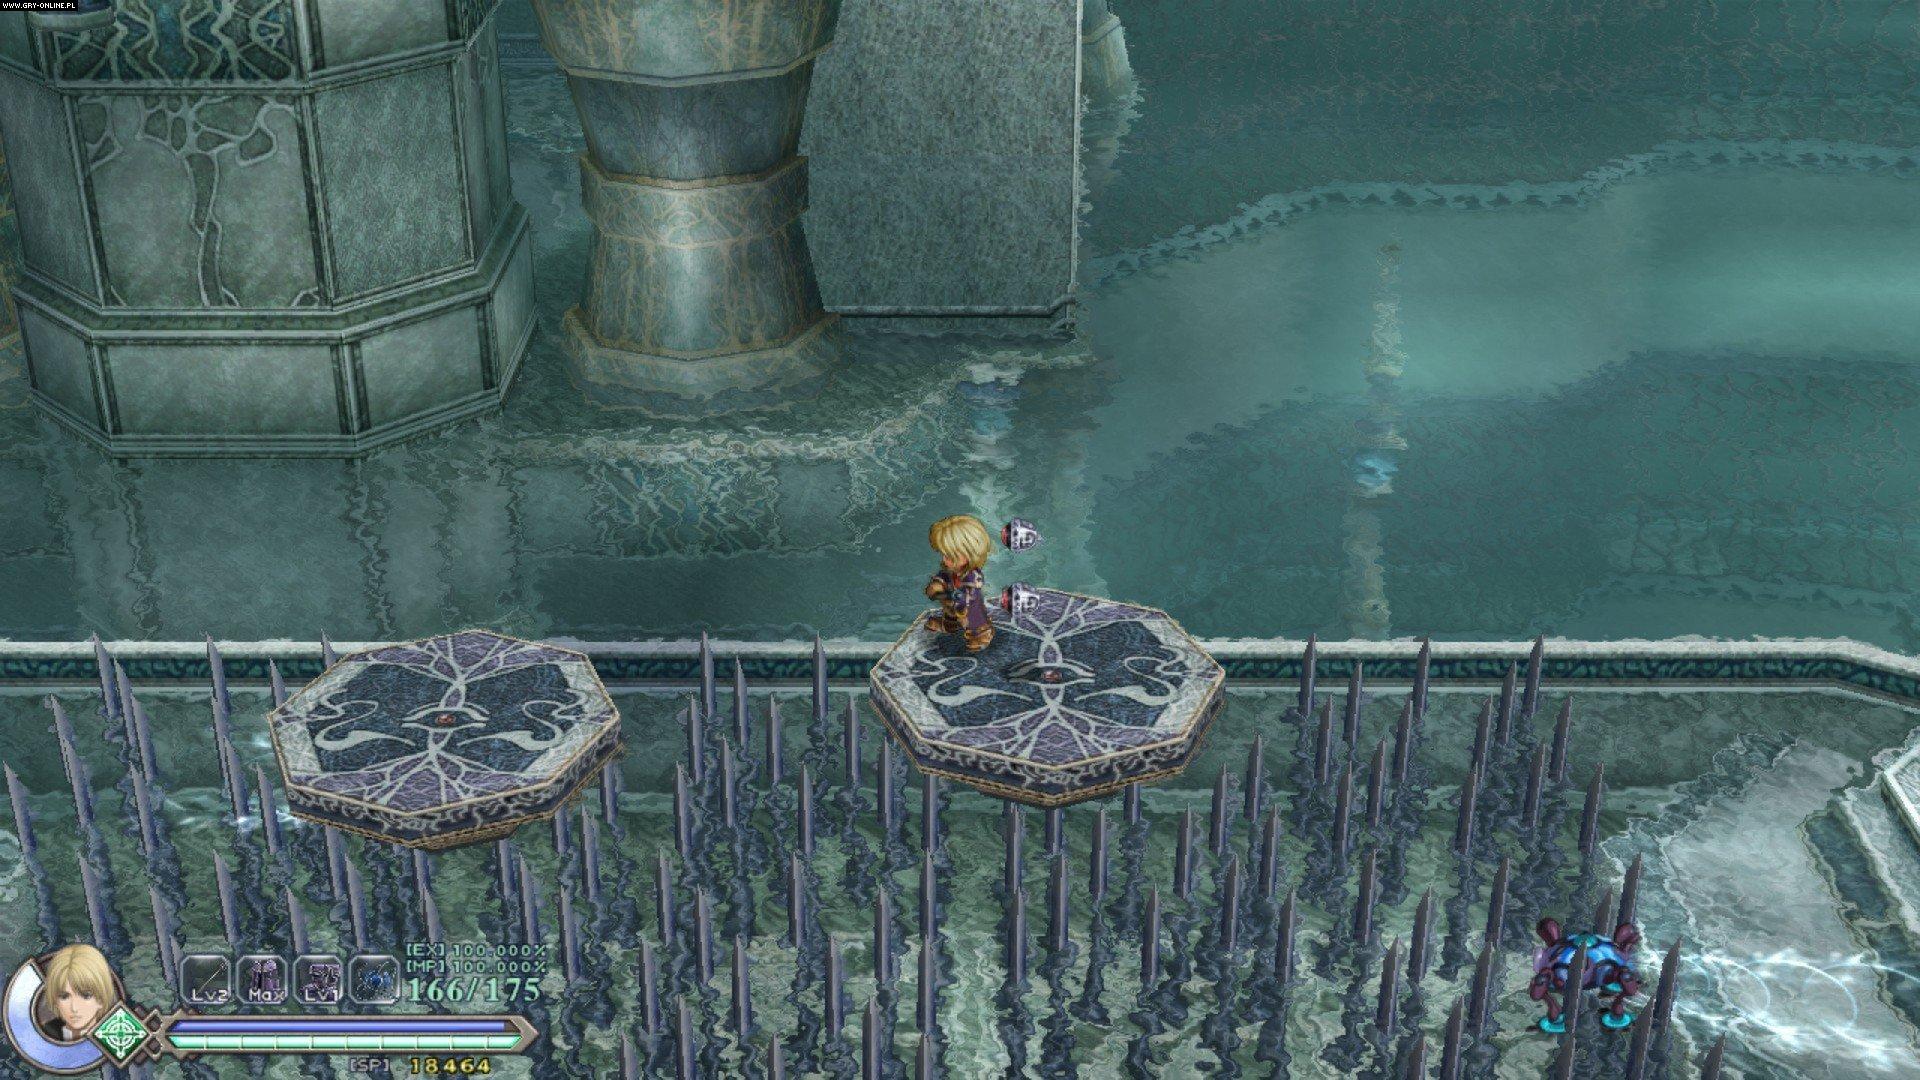 Ys Origin PC, PSV, PS4 Games Image 16/16, Nihon Falcom Corp, XSEED Games